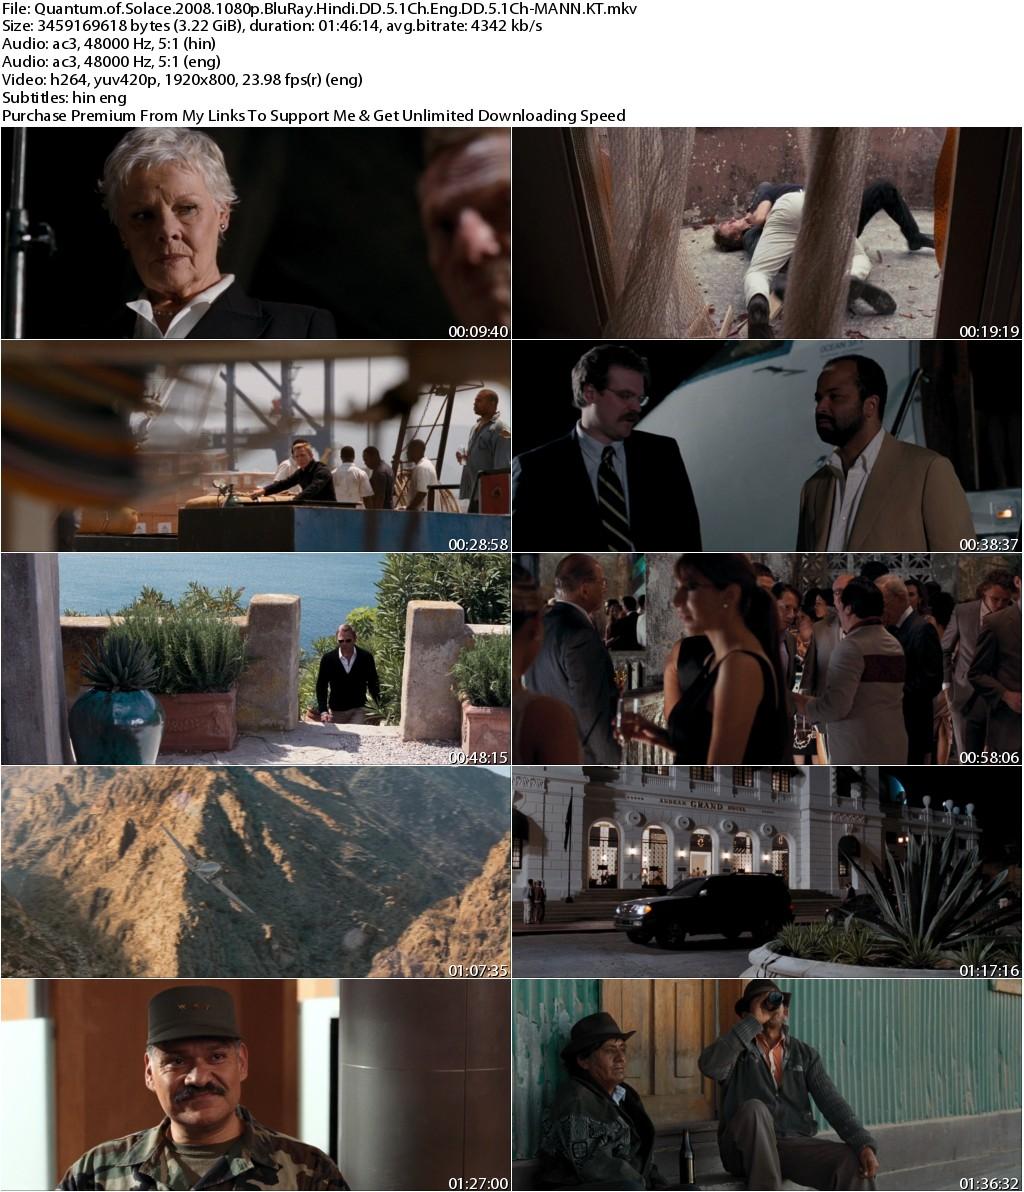 Quantum of Solace (2008) 1080p BluRay Hindi DD 5.1Ch Eng DD 5.1Ch-MANN.KT